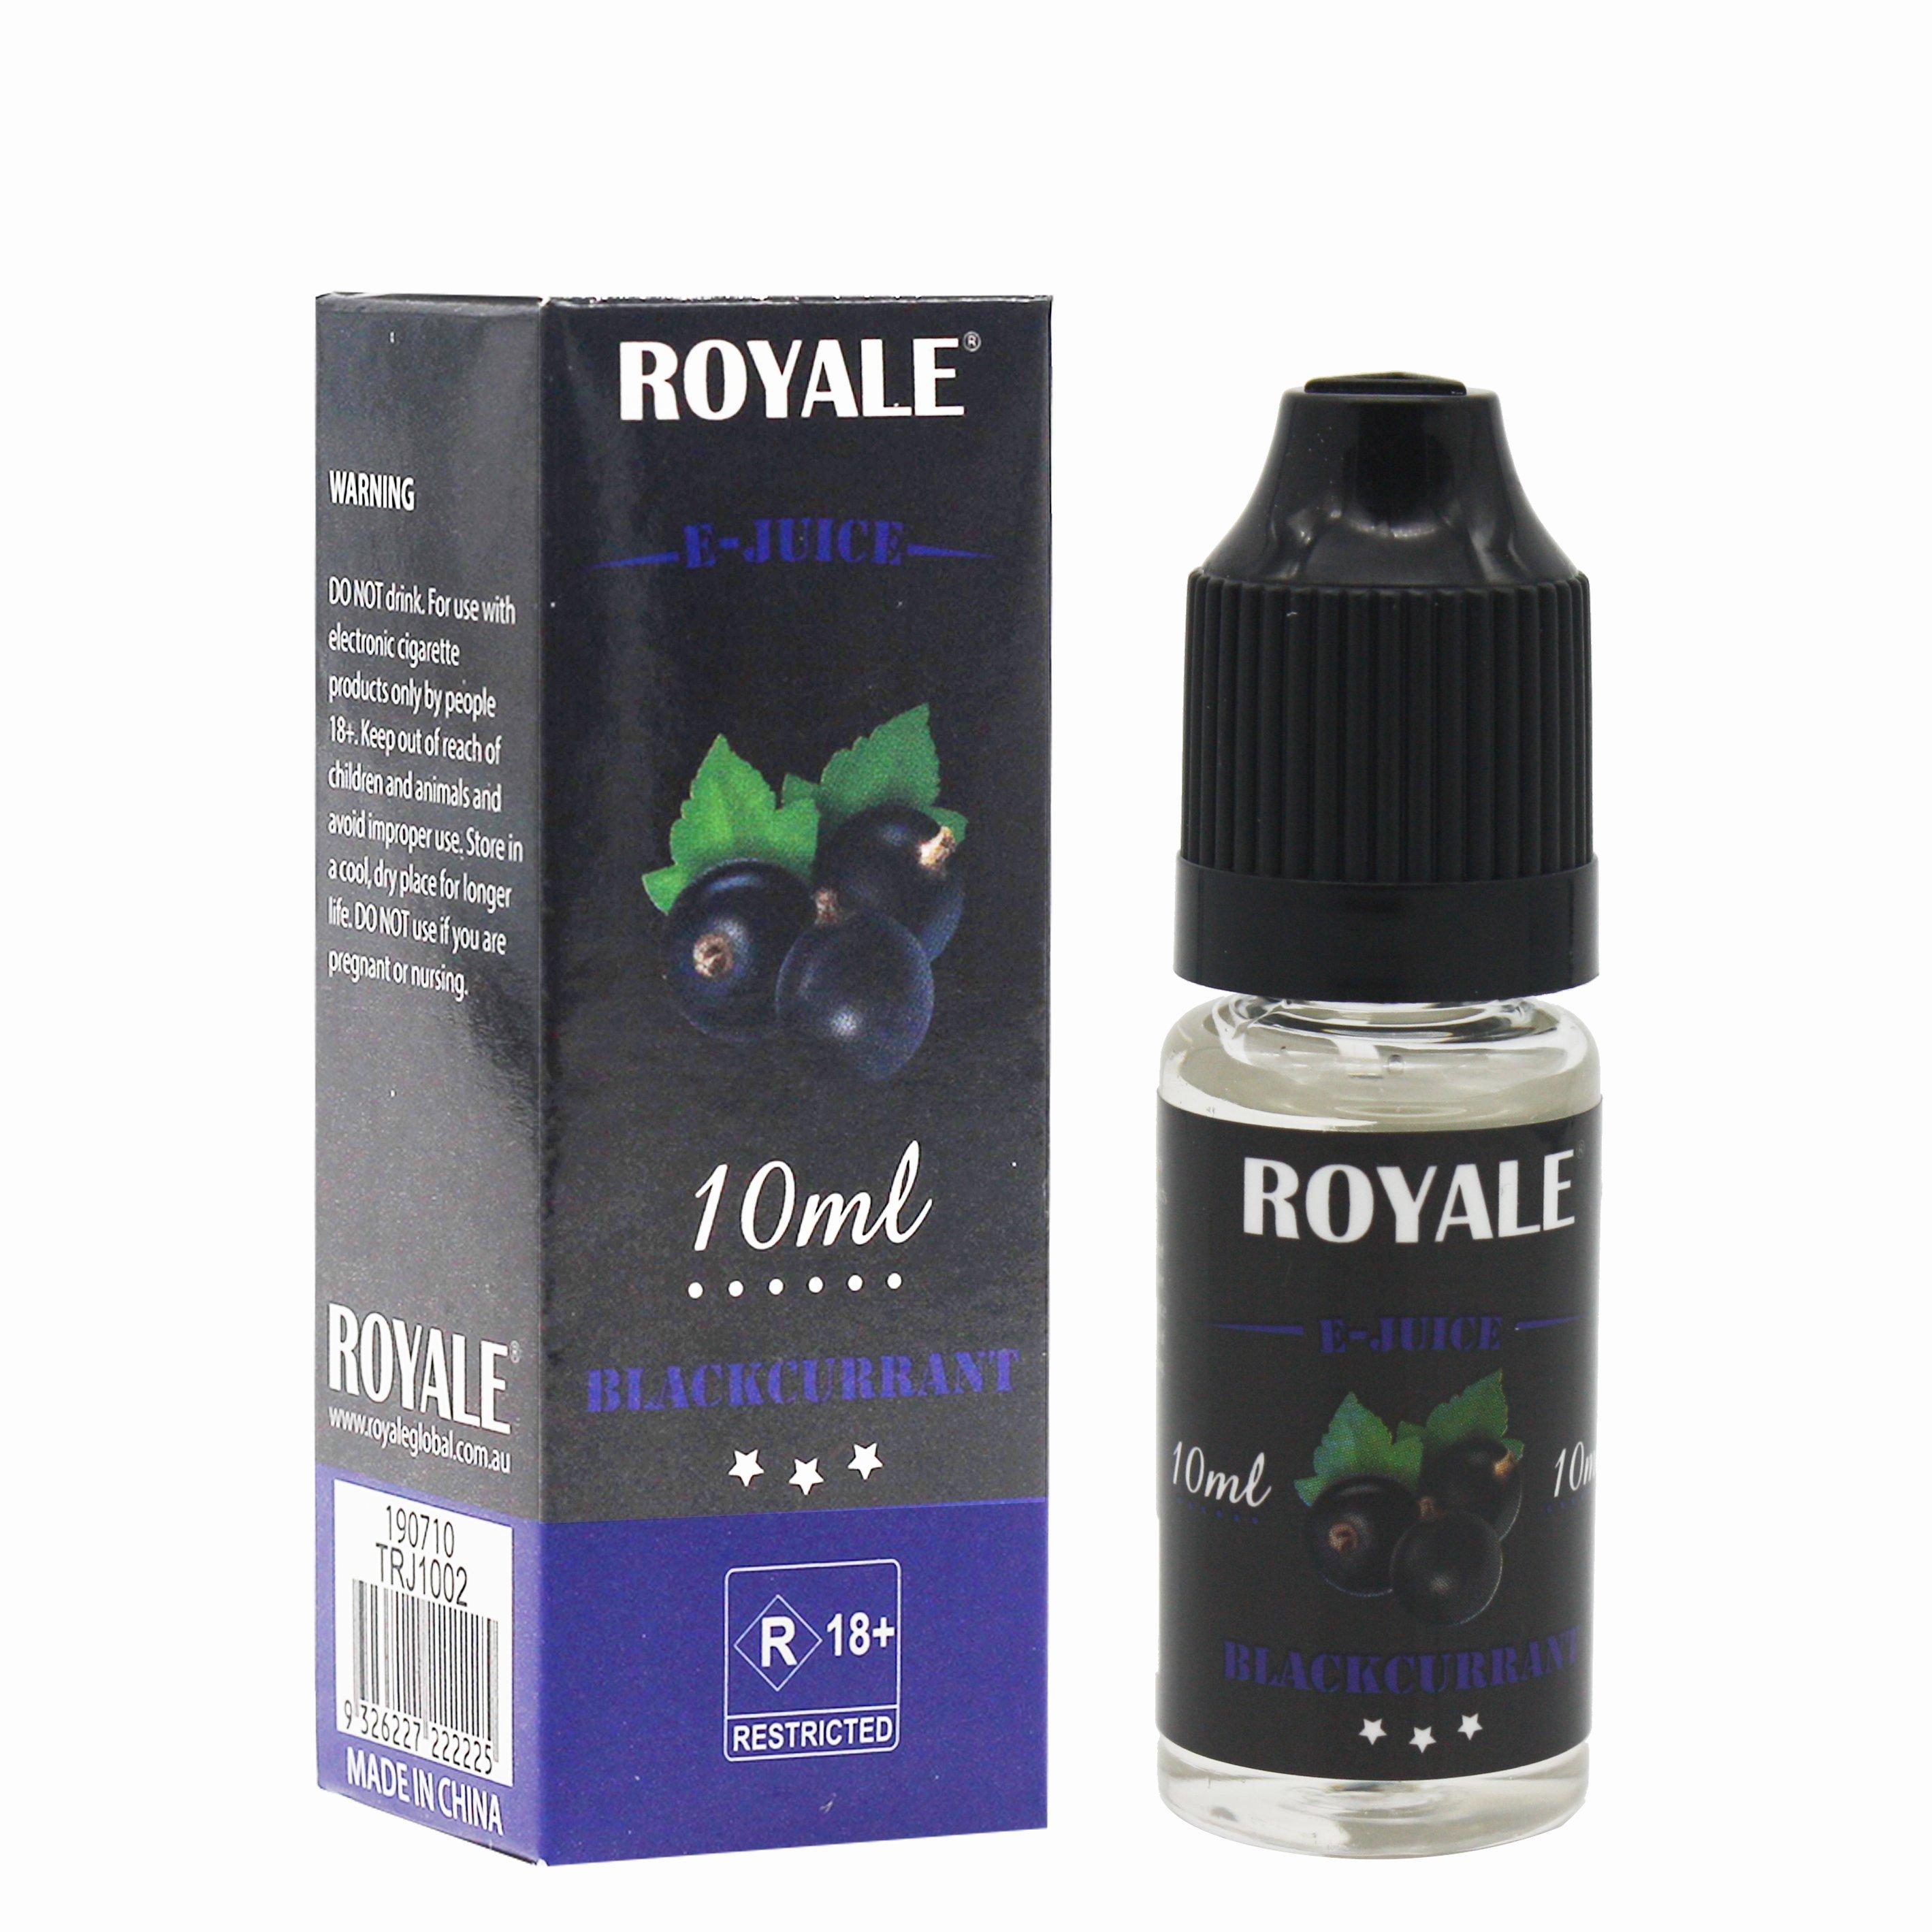 Royale E-juice- Blackcurrant